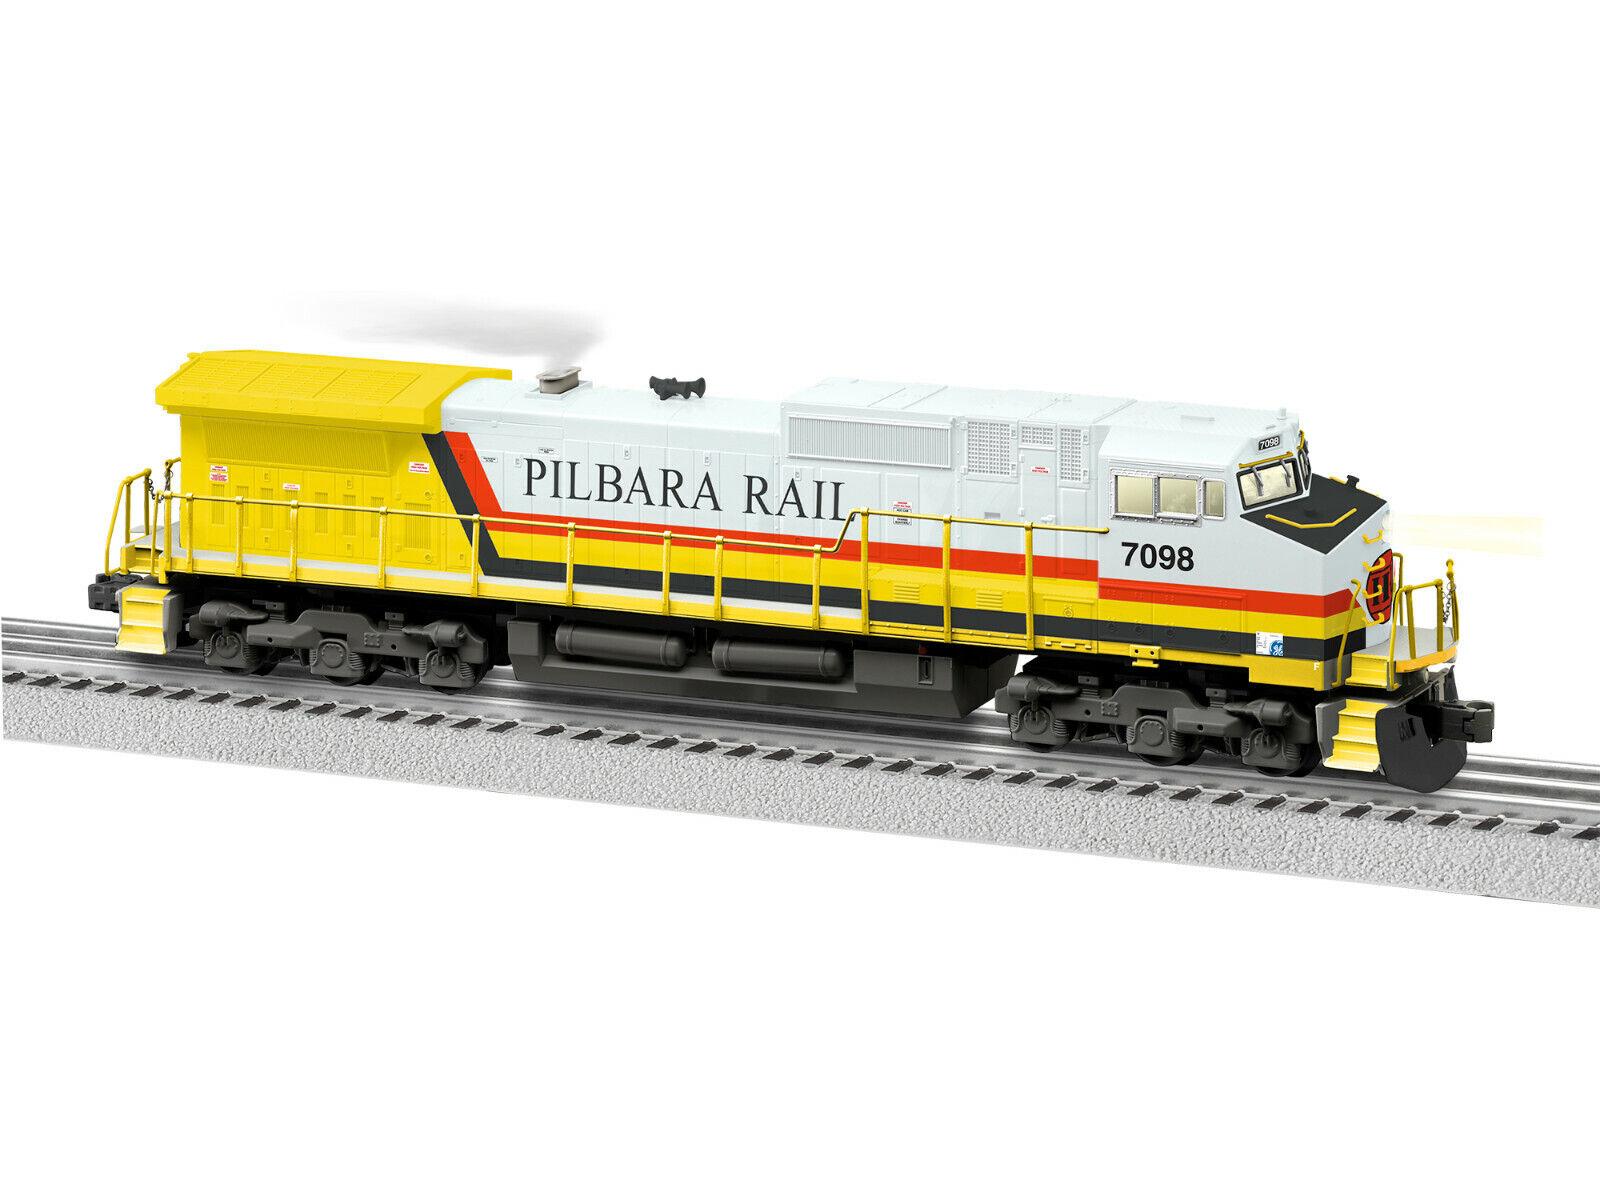 Lionel Pilbara Rail Legacy C44-9W utan motor